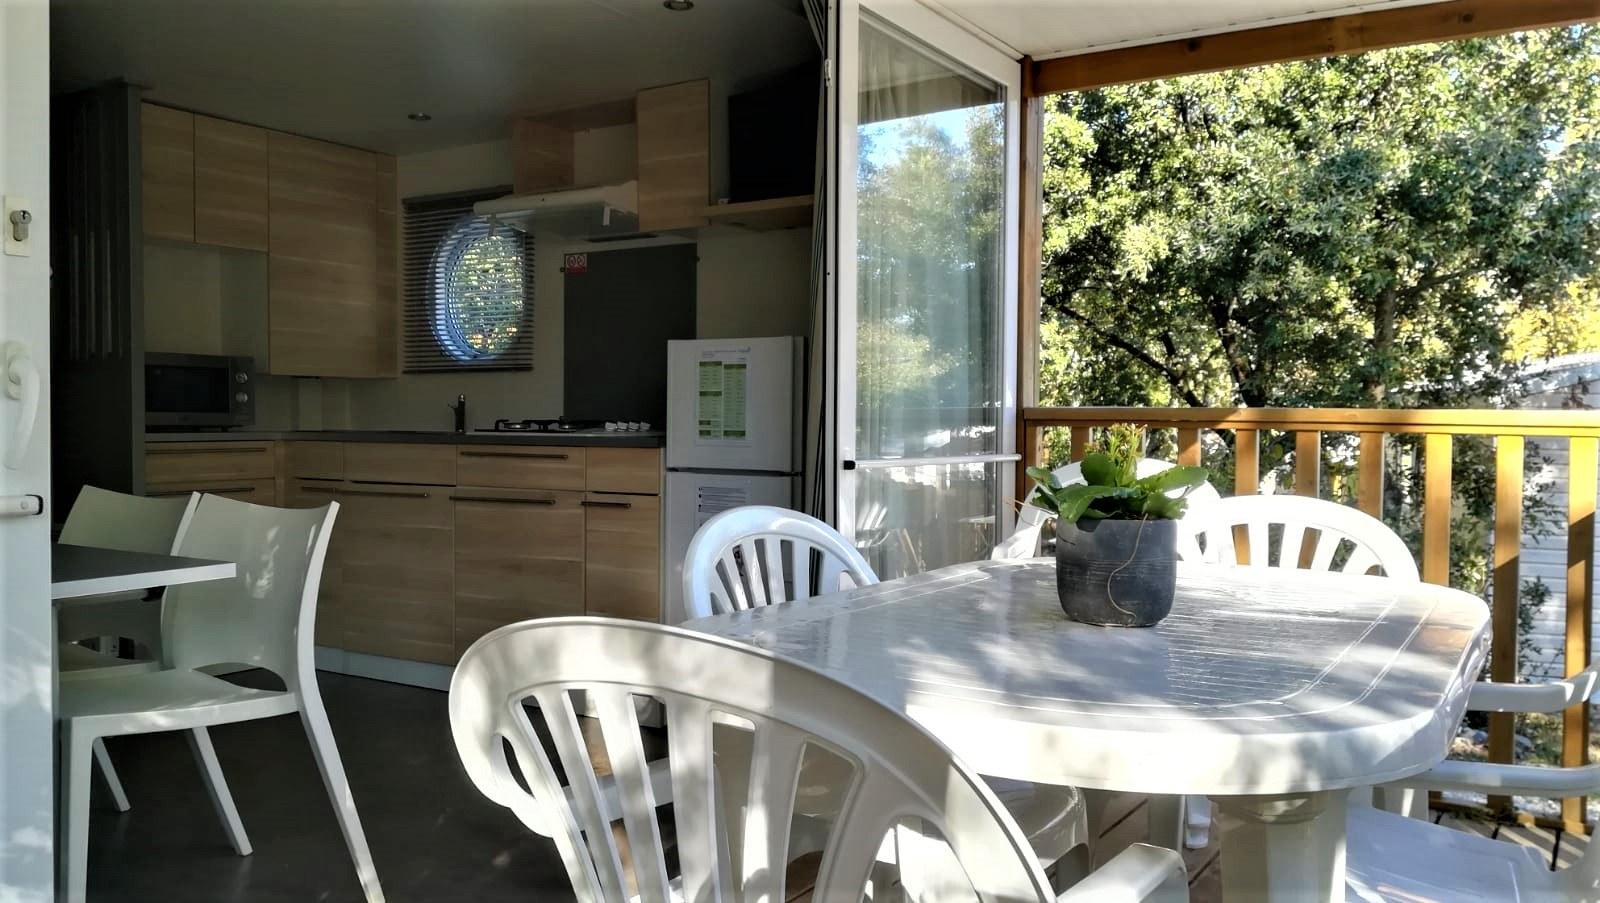 loggia premium séjour 09  - camping piscine familial proche ardeche gorges.